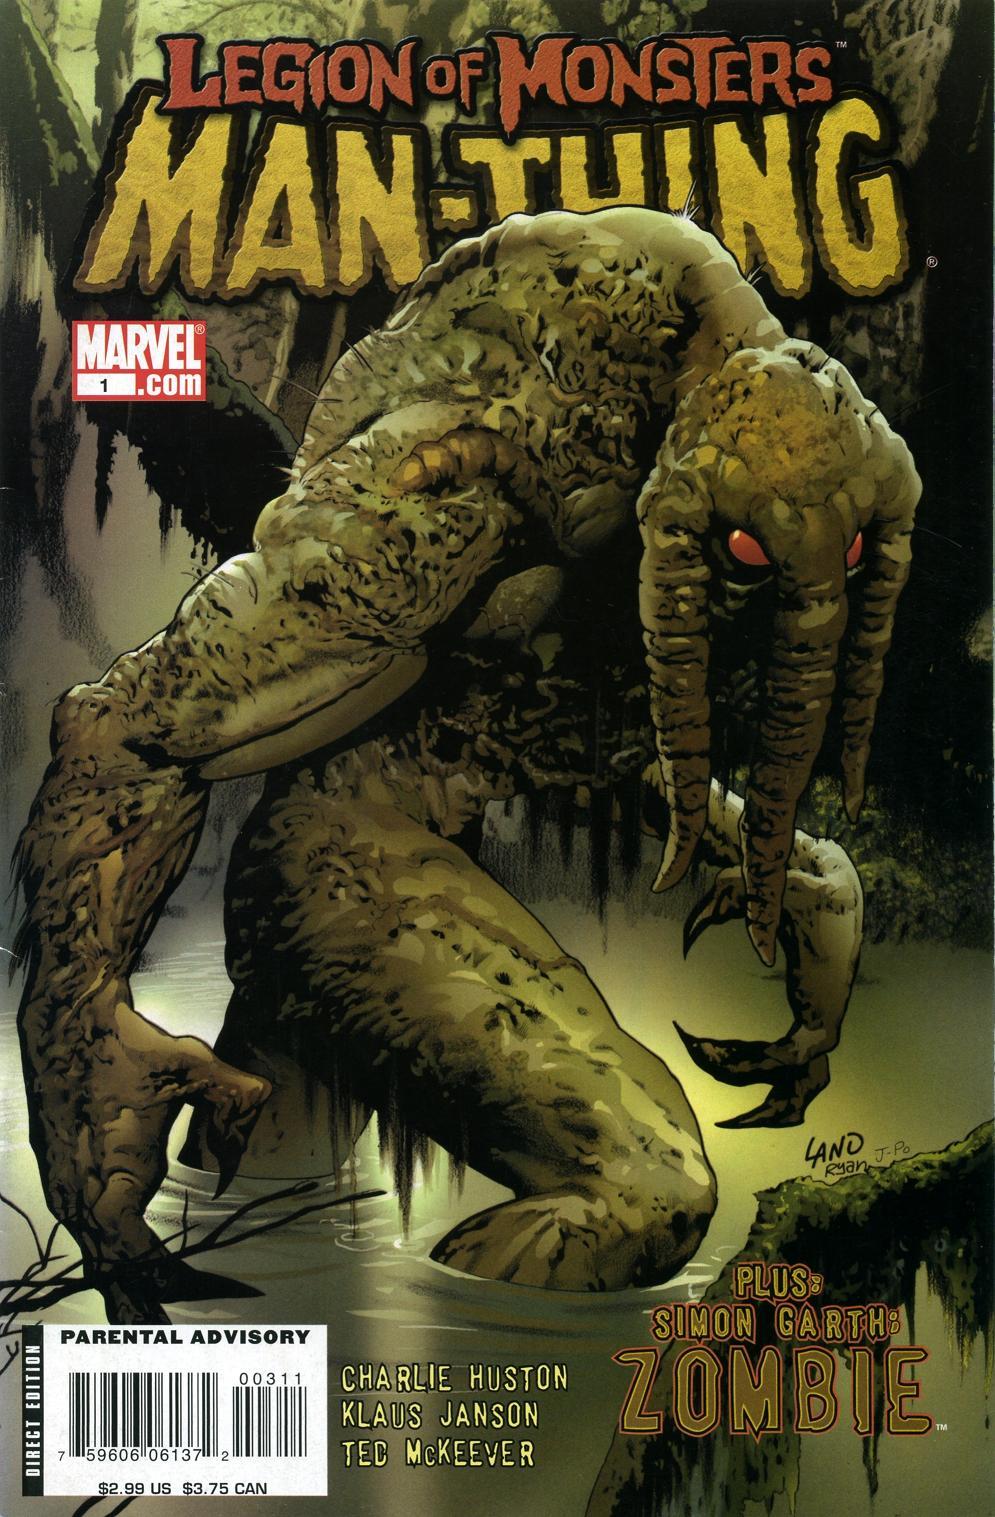 https://marswillsendnomore.files.wordpress.com/2011/12/legion-of-monsters-man-thing-1-001.jpg